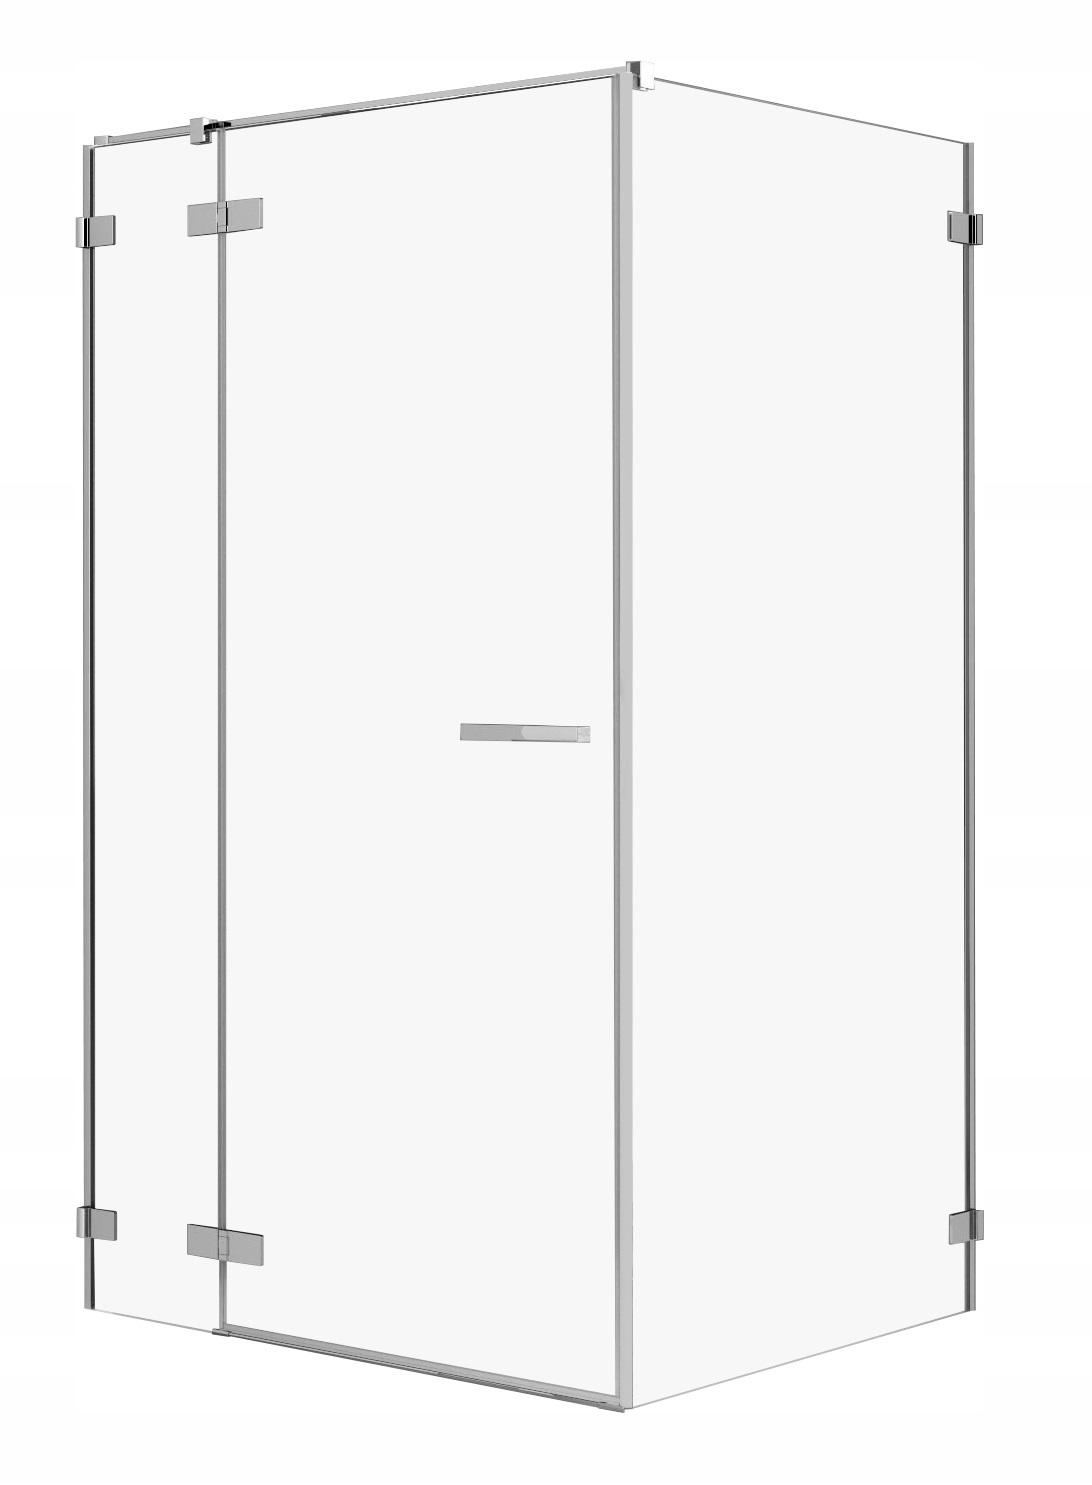 Sprcha Umenia II KDJ RADAWAY 130x110